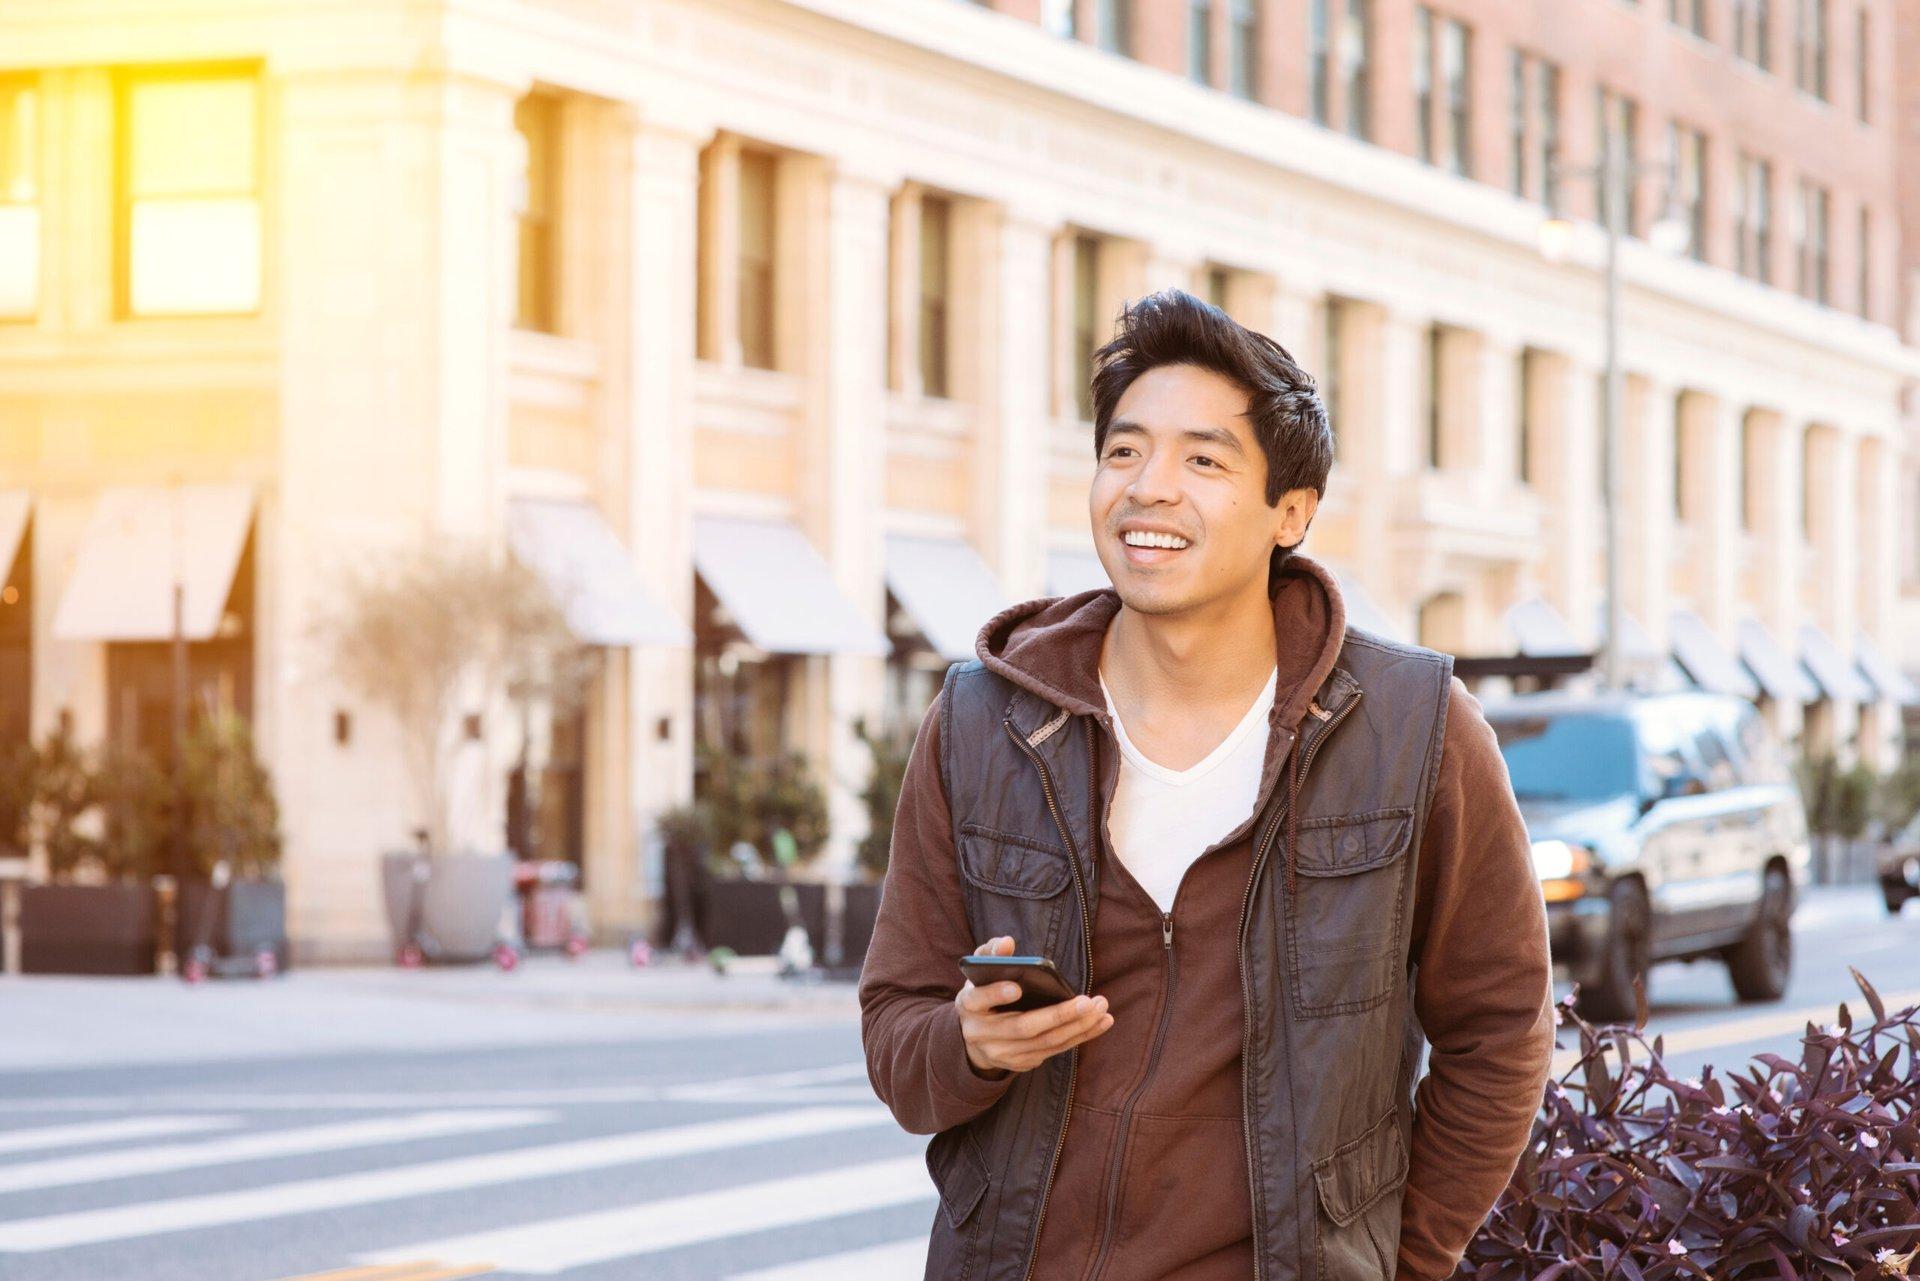 Man using phone to schedule Lyft ride